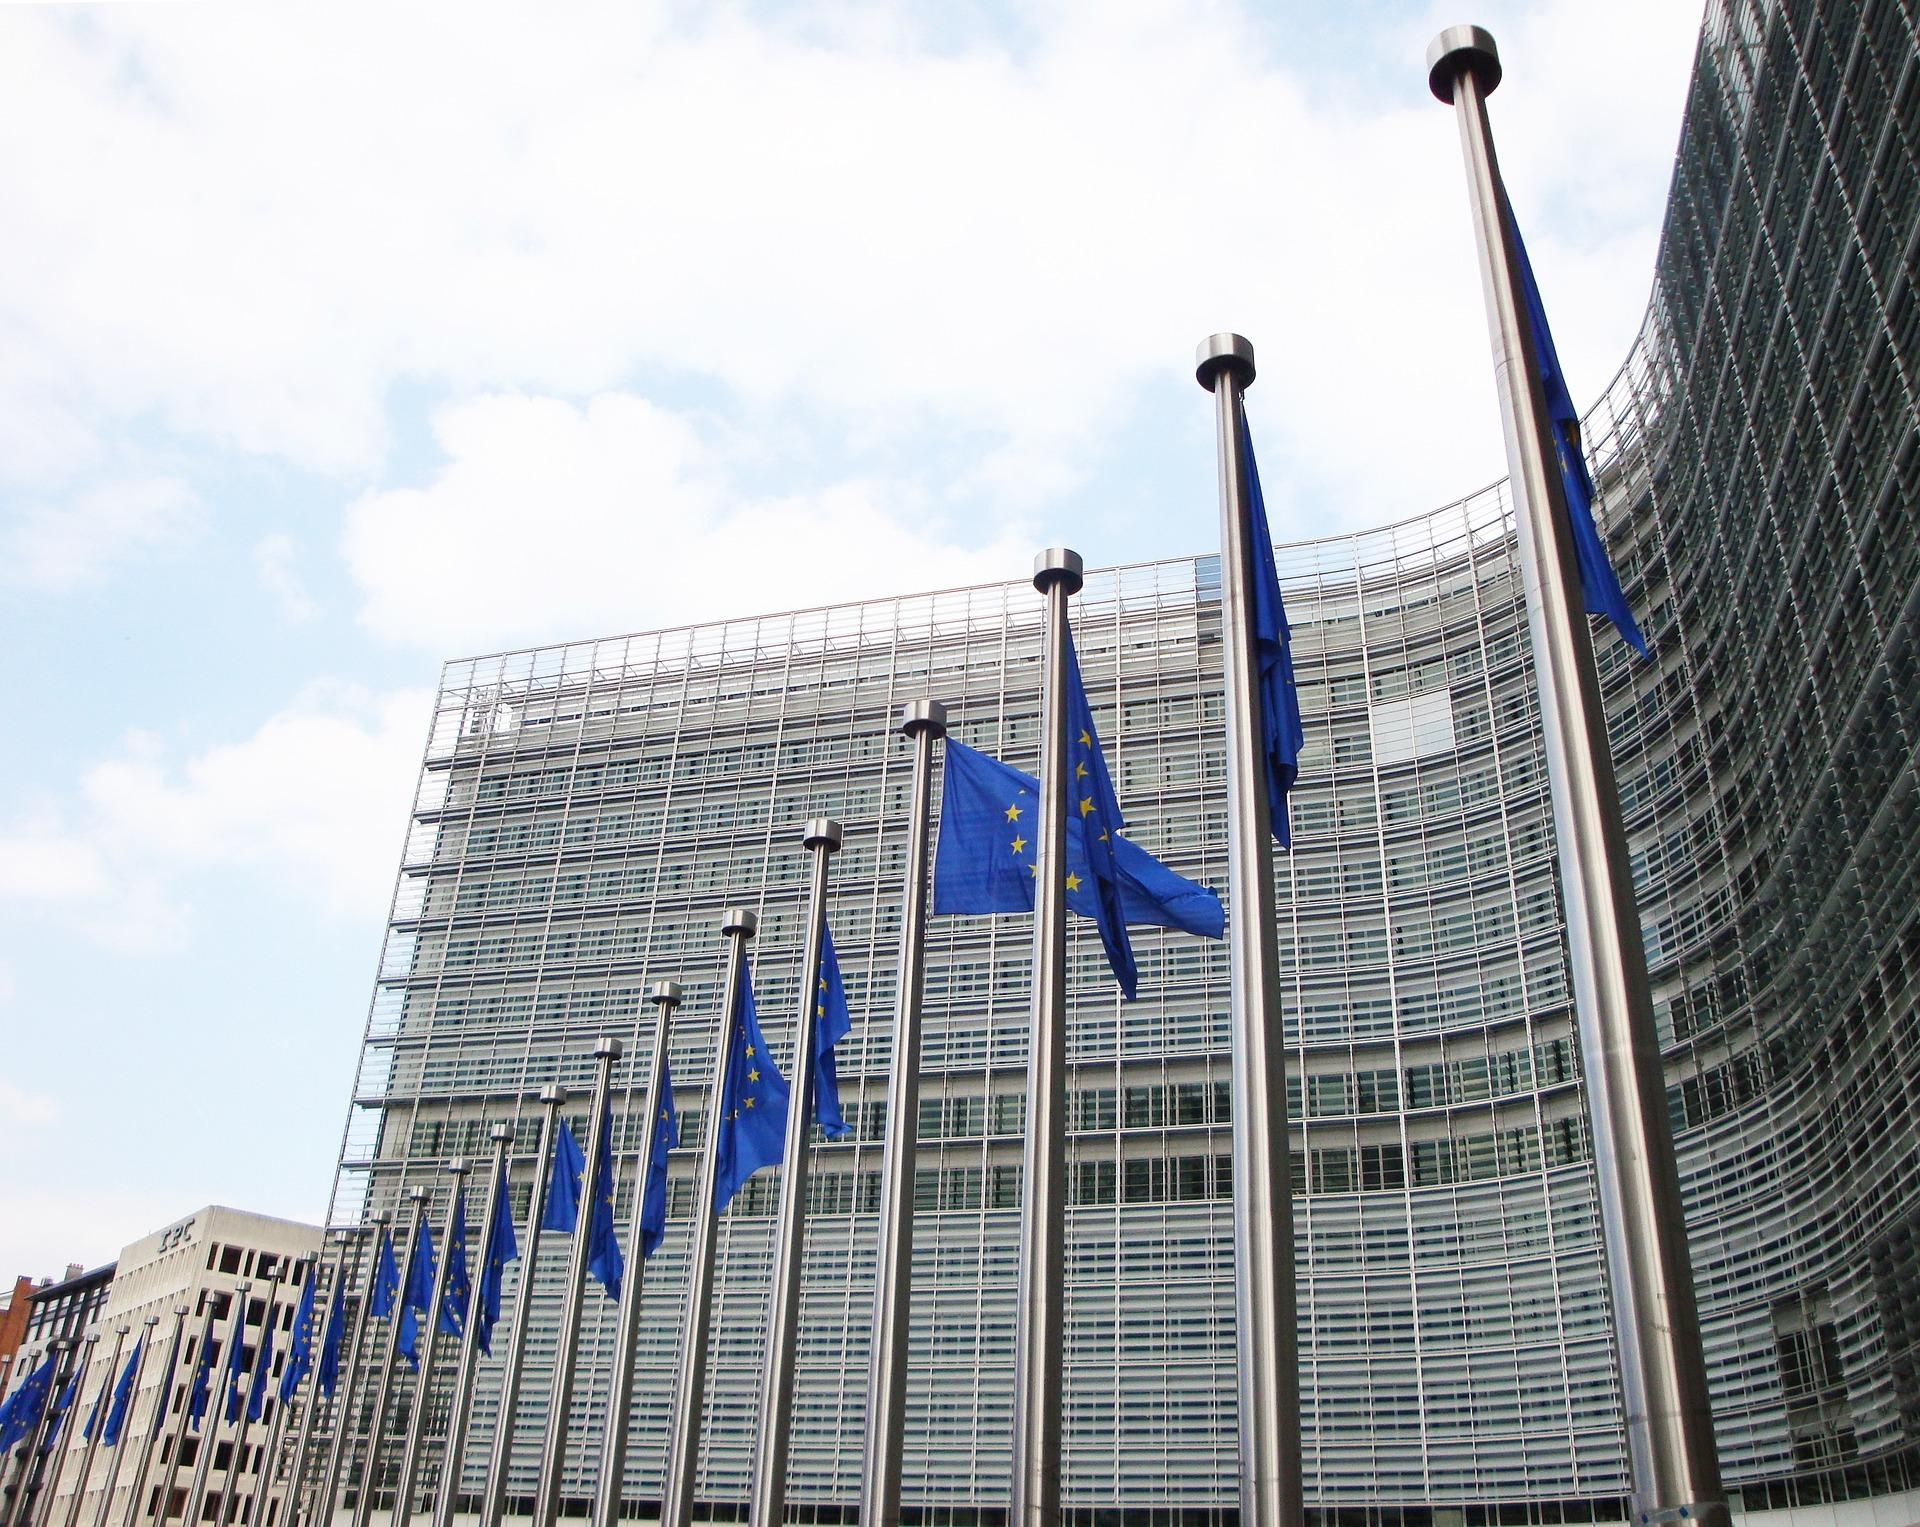 Karlsruhe hält den Europäischen Stabilitätsmechanismus